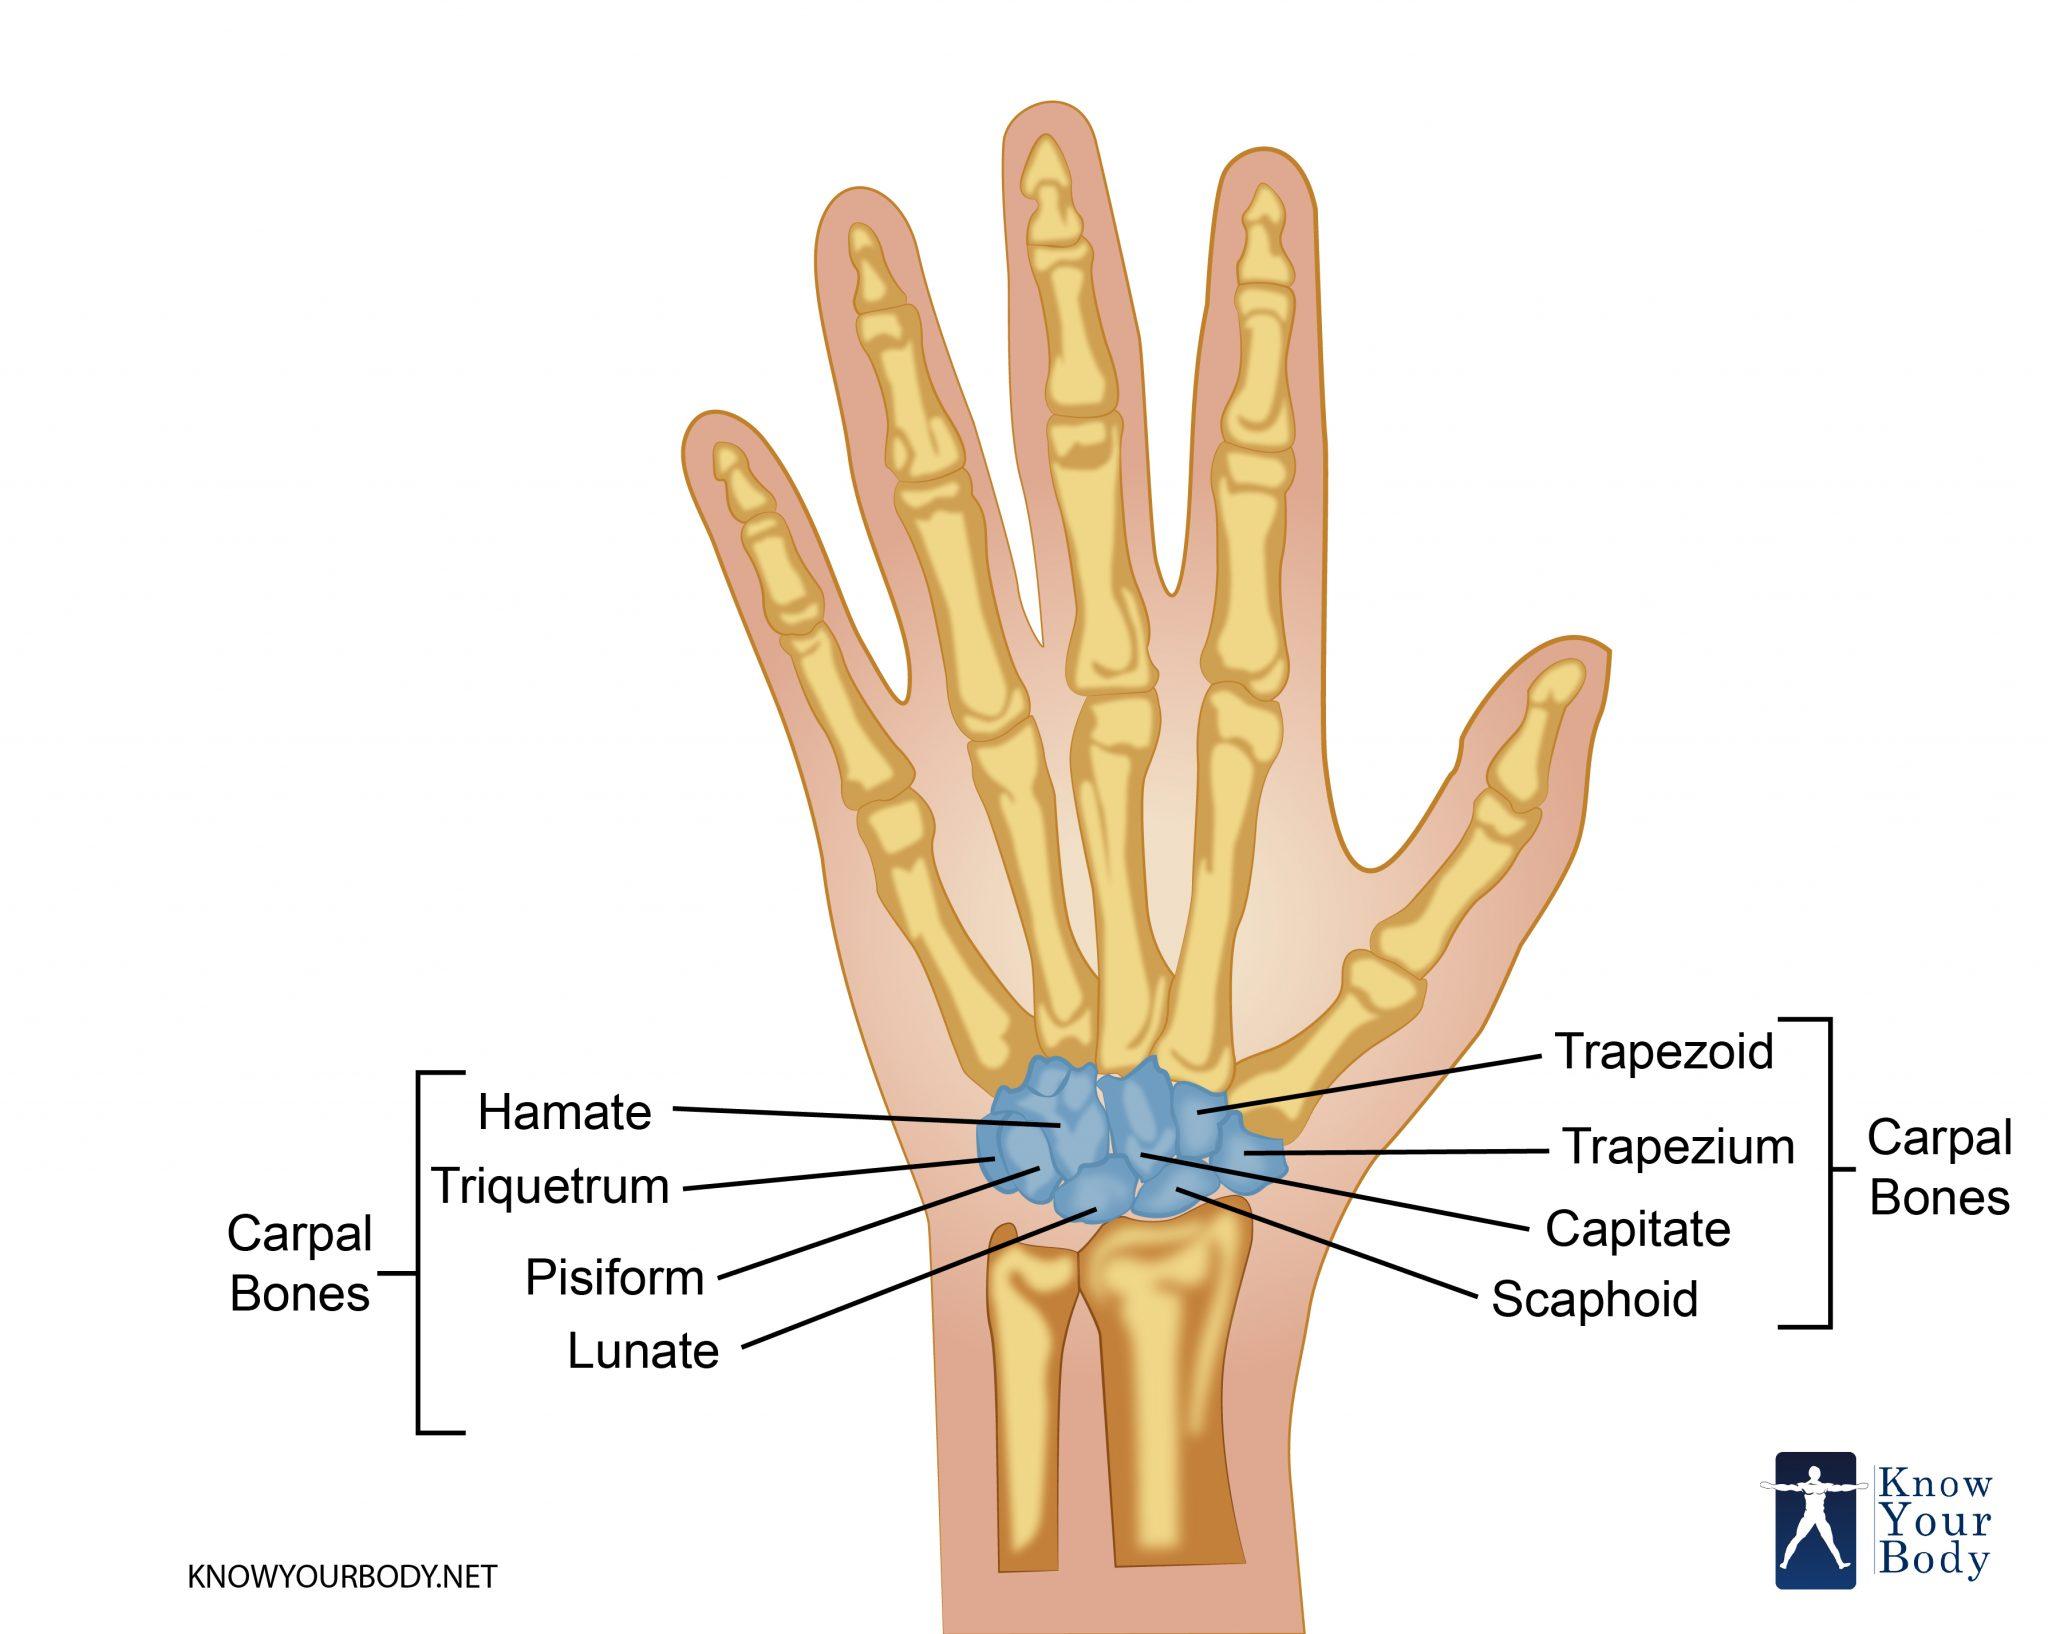 Carpal Bones Location